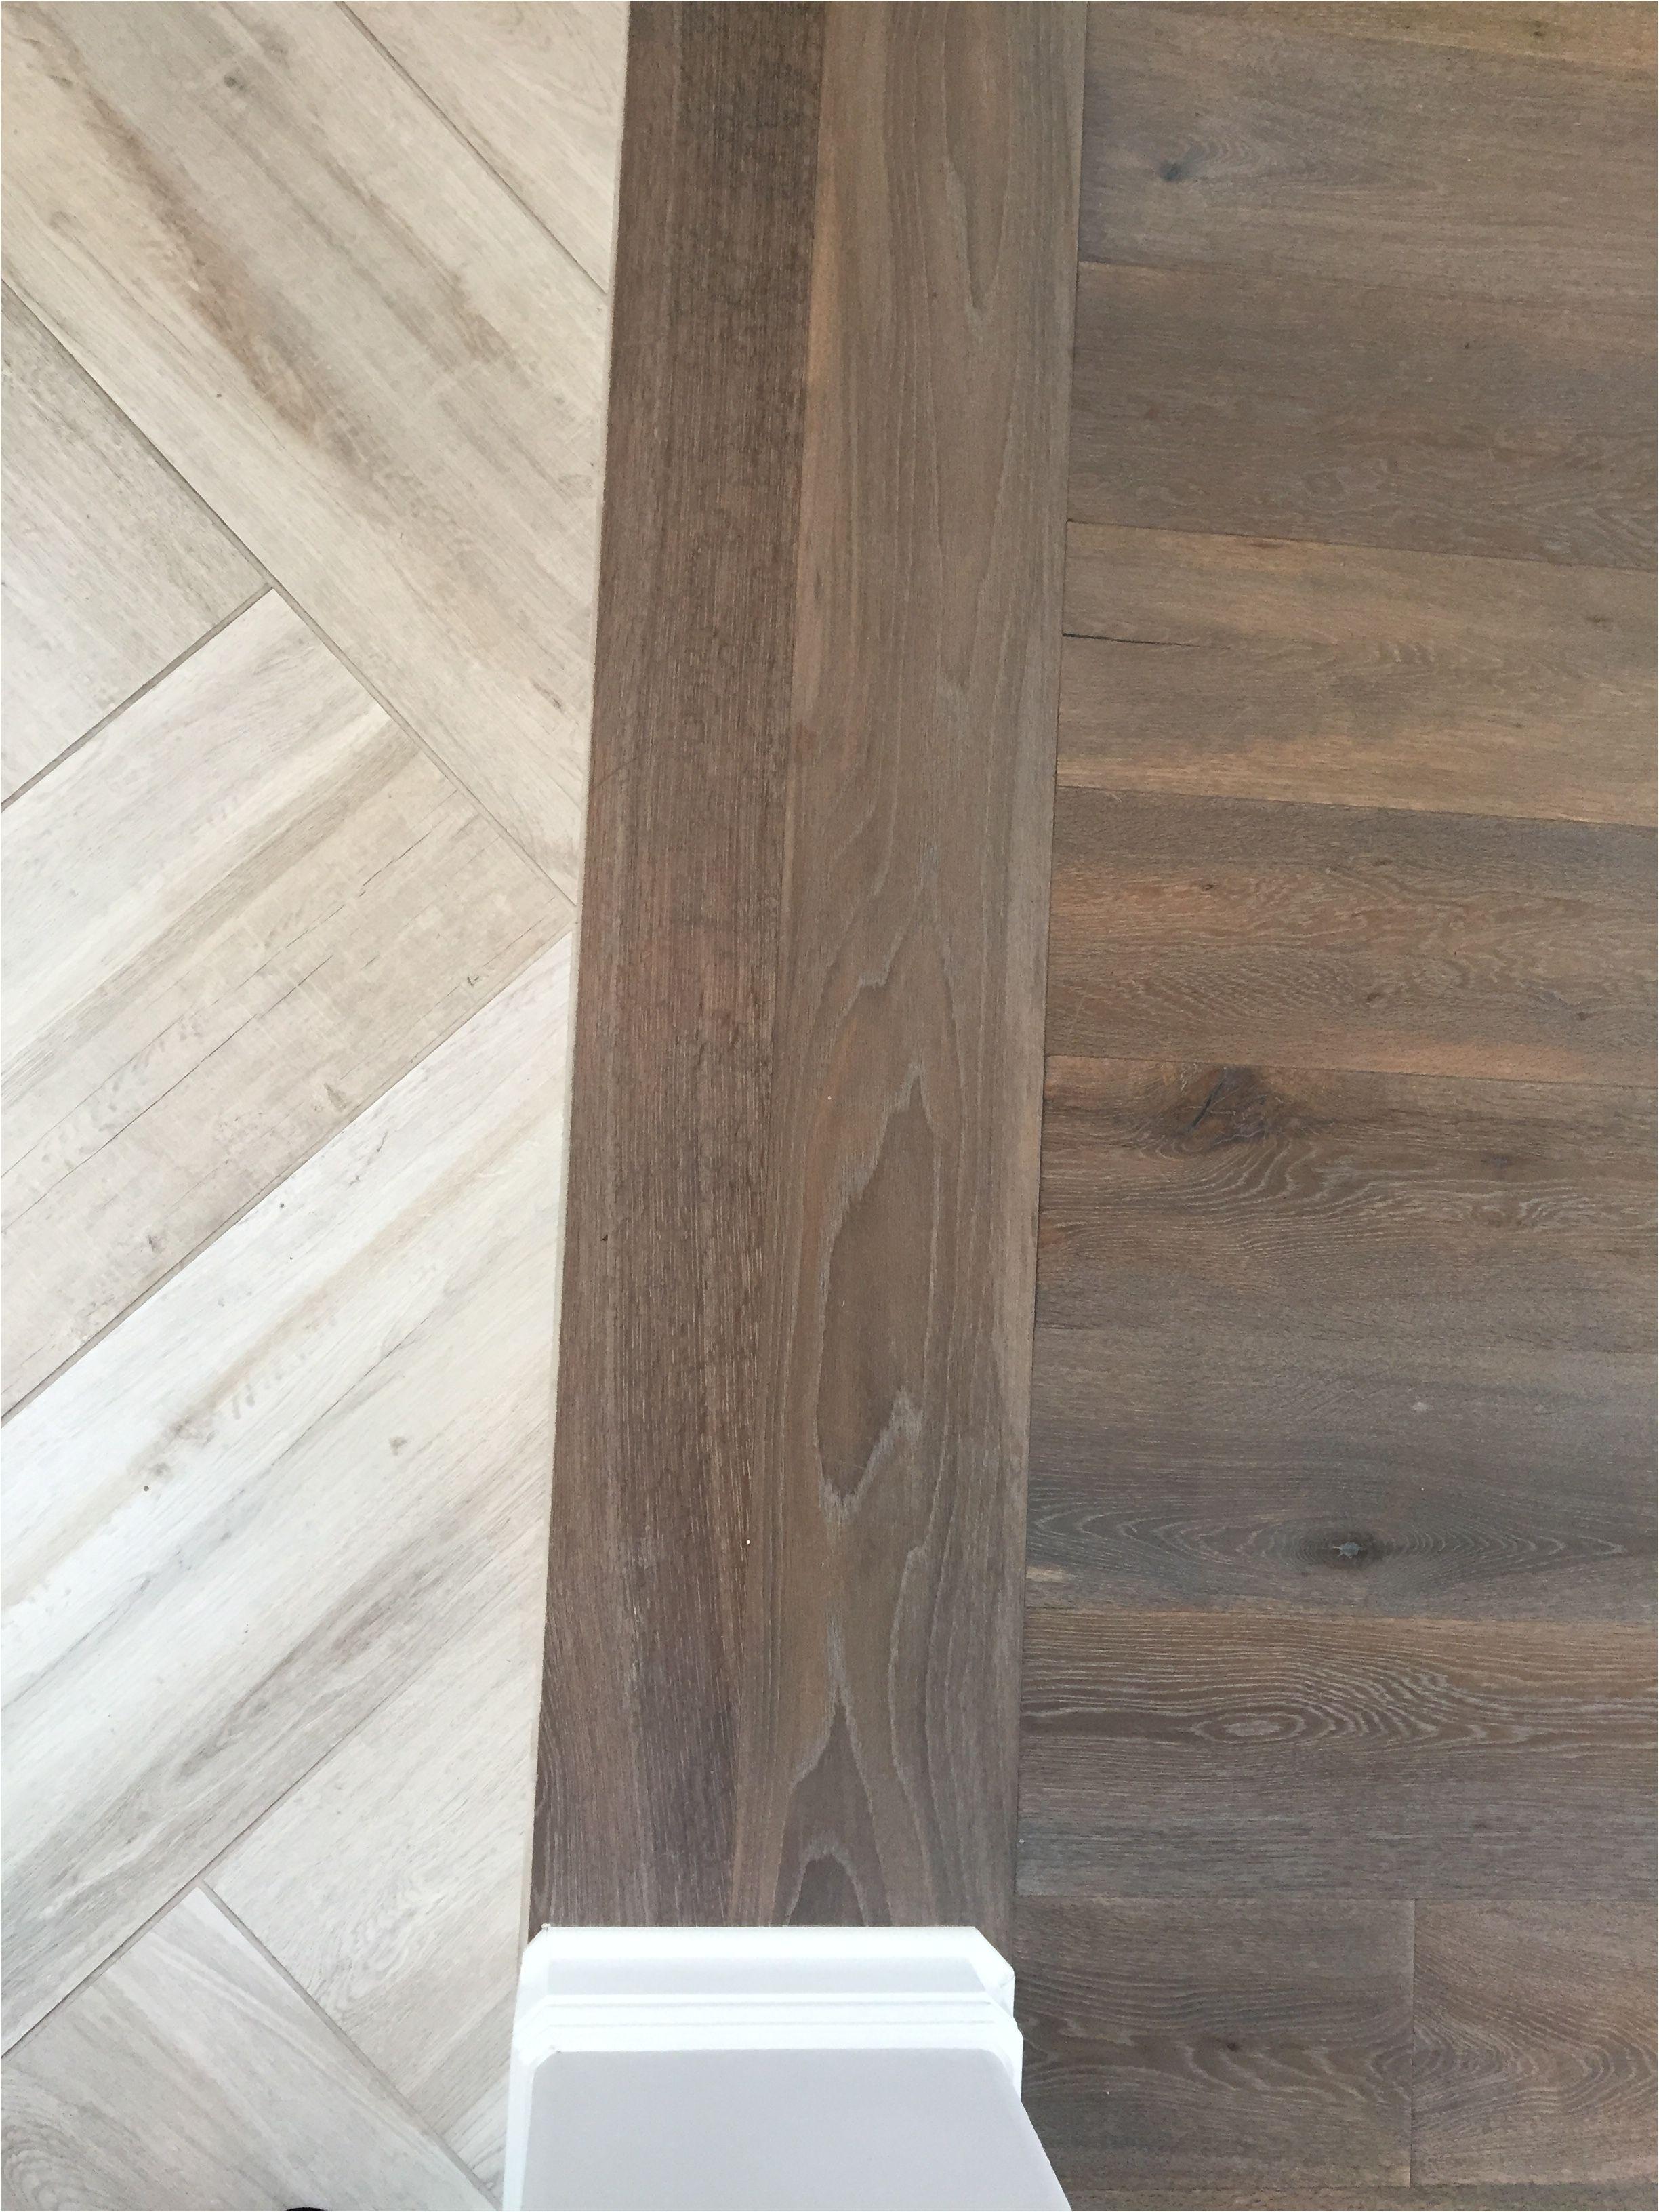 Vinyl Plank Flooring Installation Bathroom Floor Transition Laminate to Herringbone Tile Pattern Model